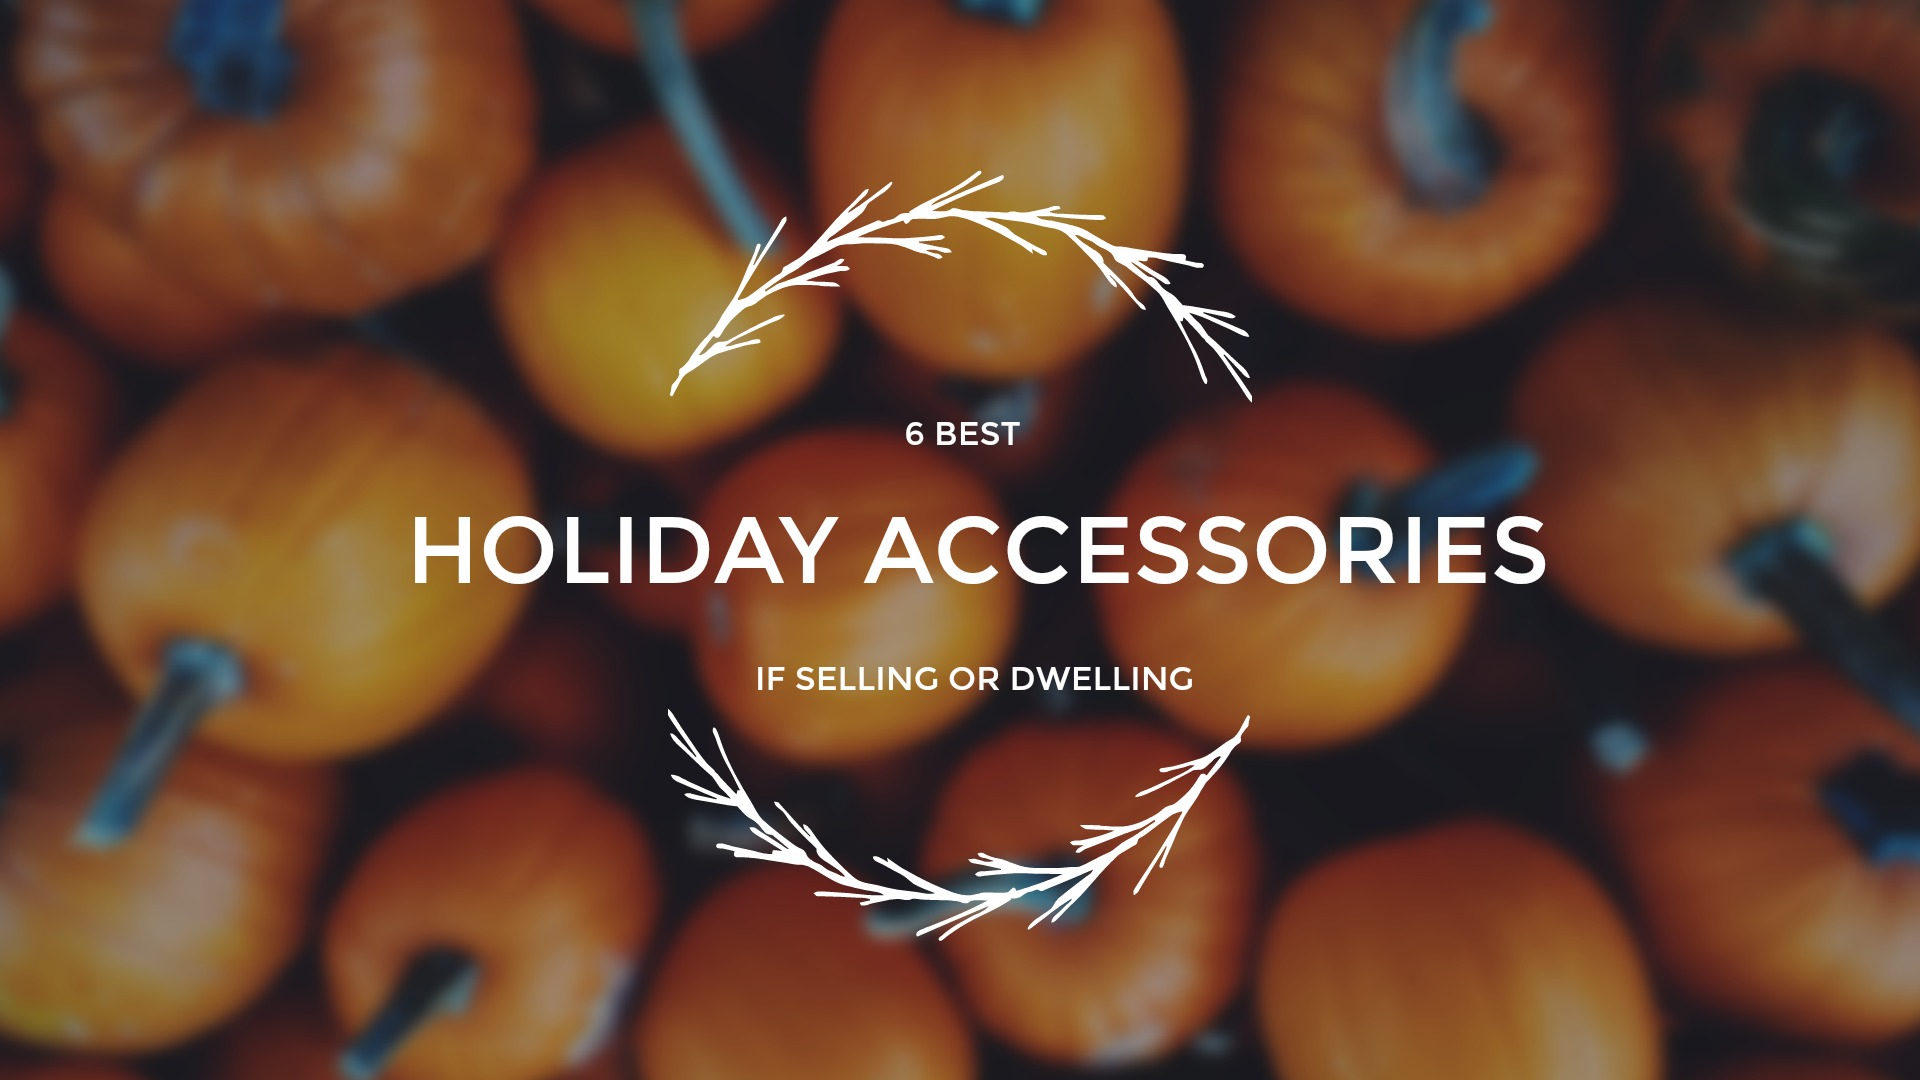 6-BEST-HOLIDAY-ACCESSORIES.jpg